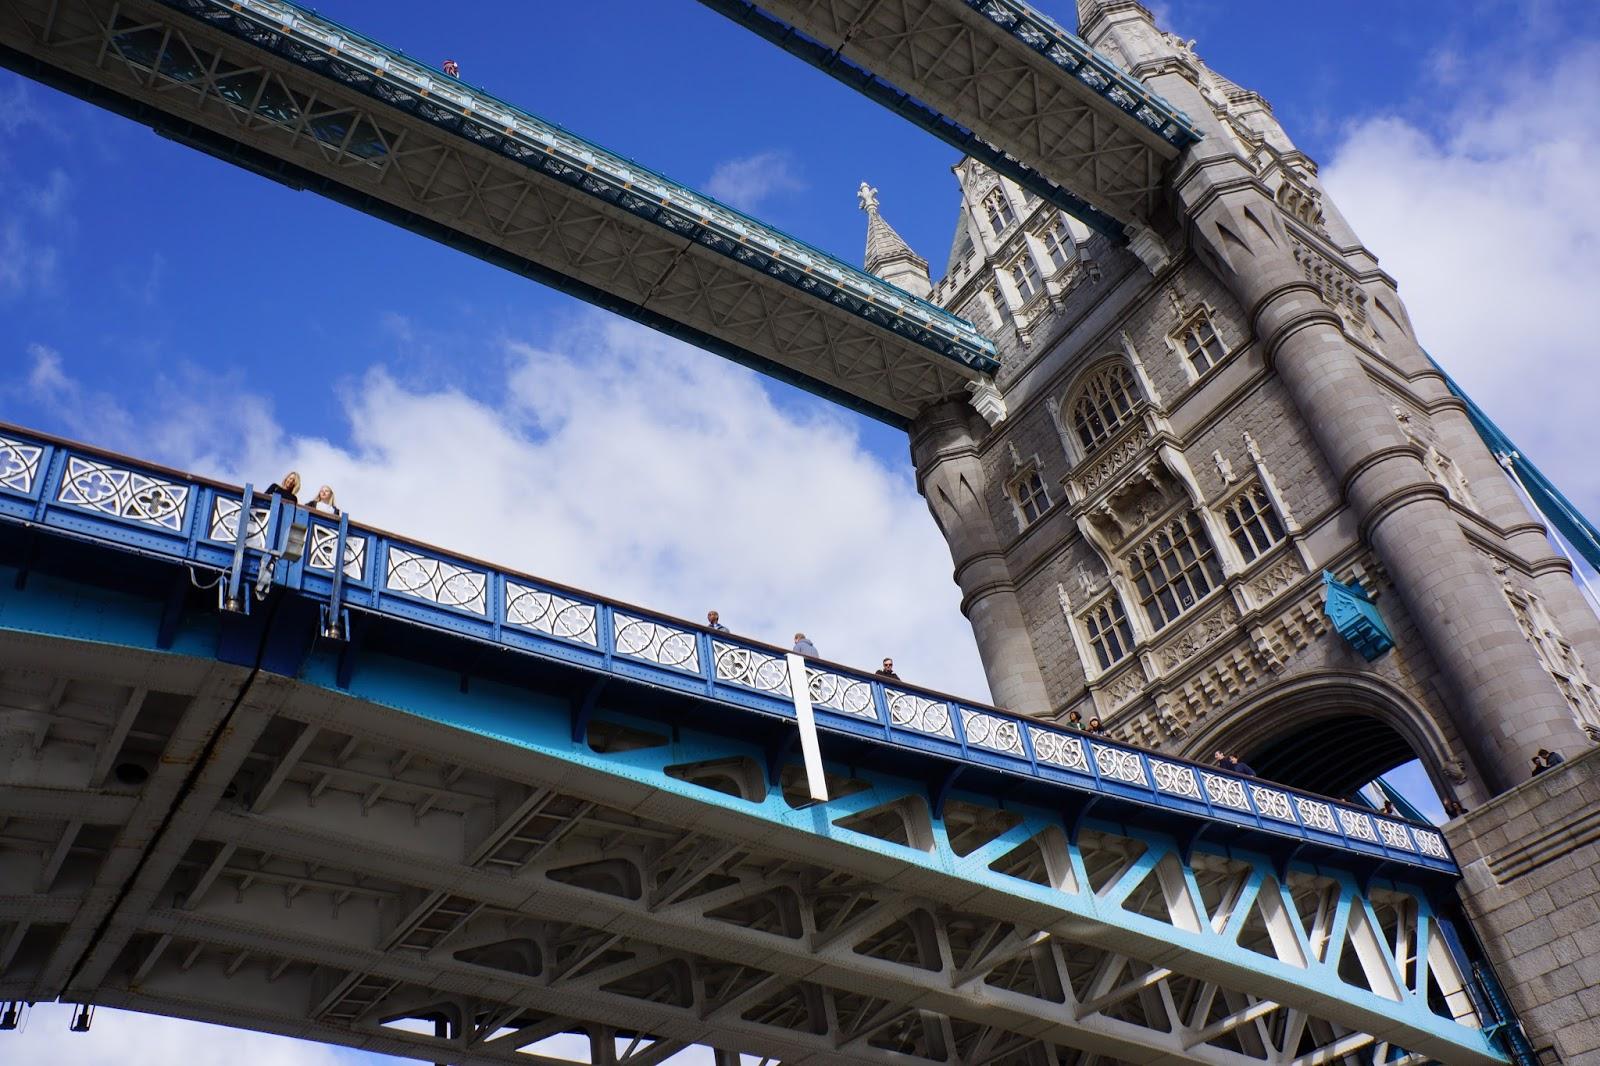 tower bridge from a boat below